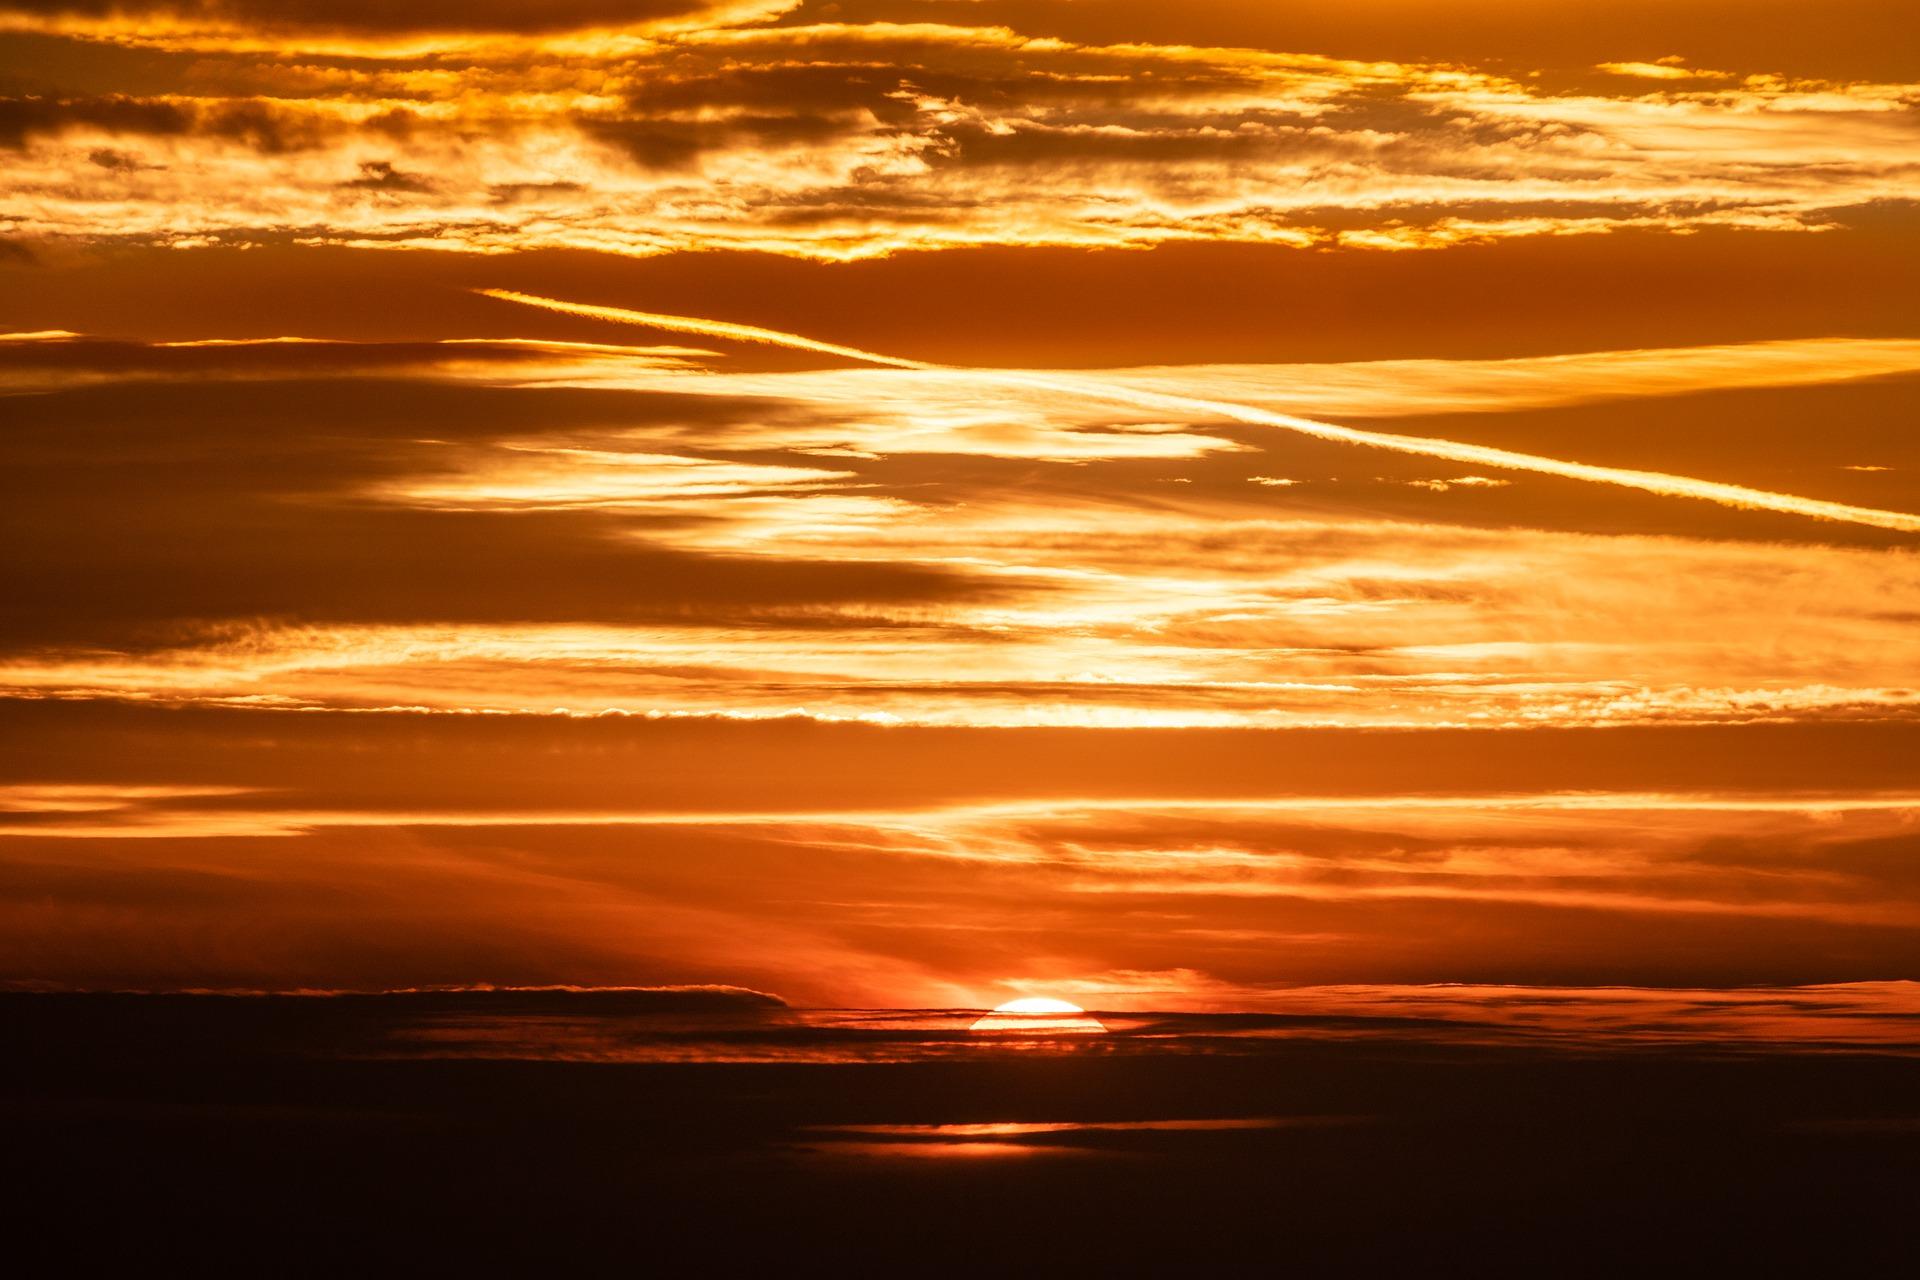 setting-sun-3687200_1920